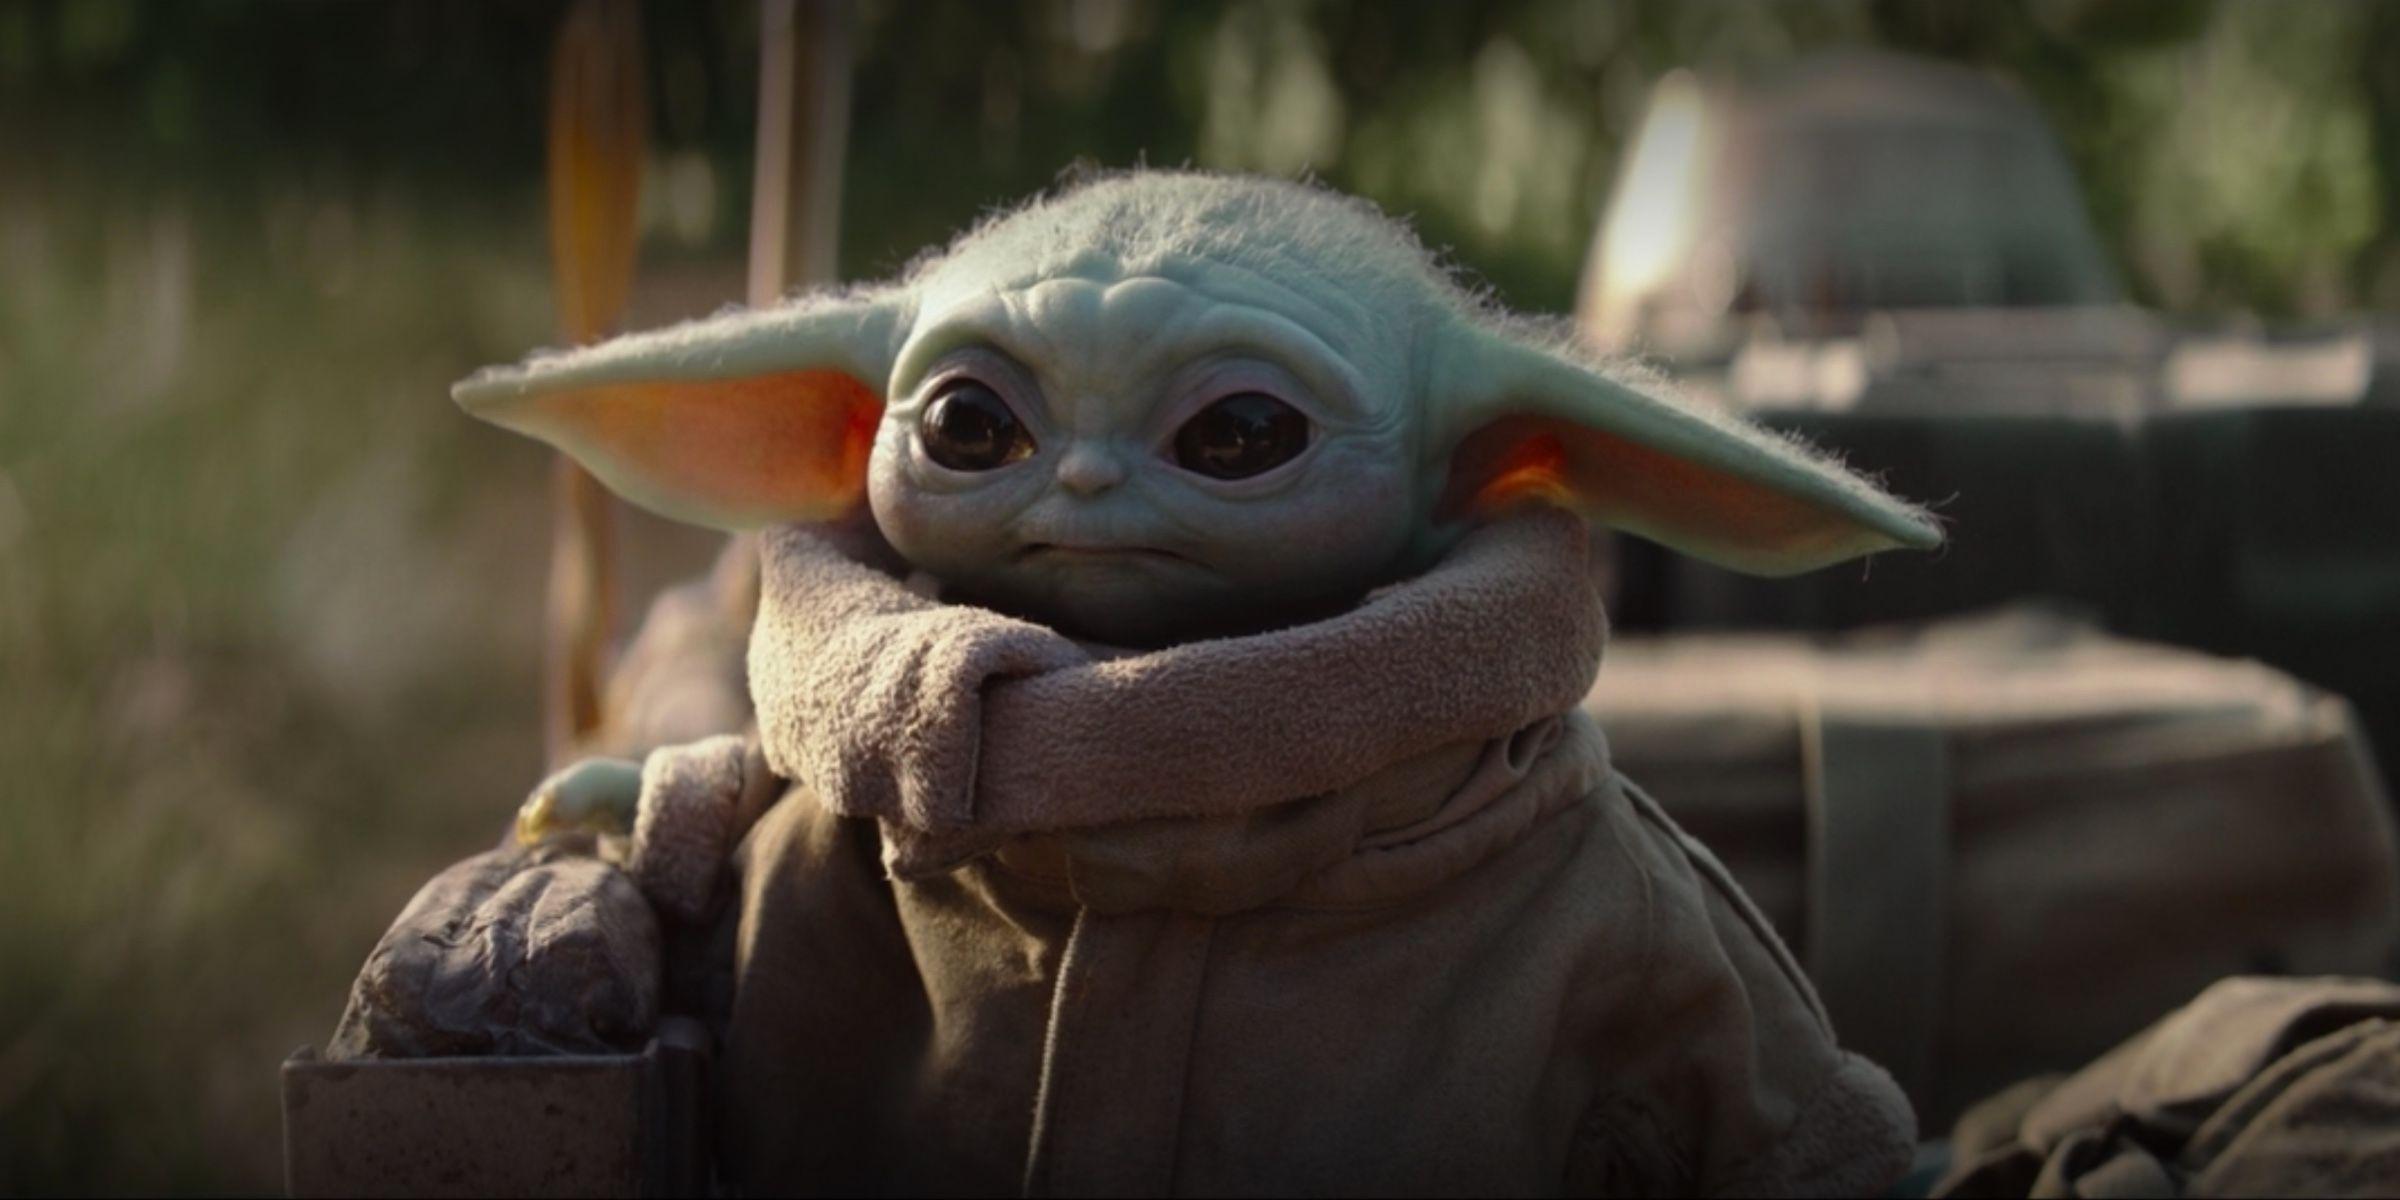 Dwayne Johnson Snuggles The Mandalorians Baby Yoda In Fan Art